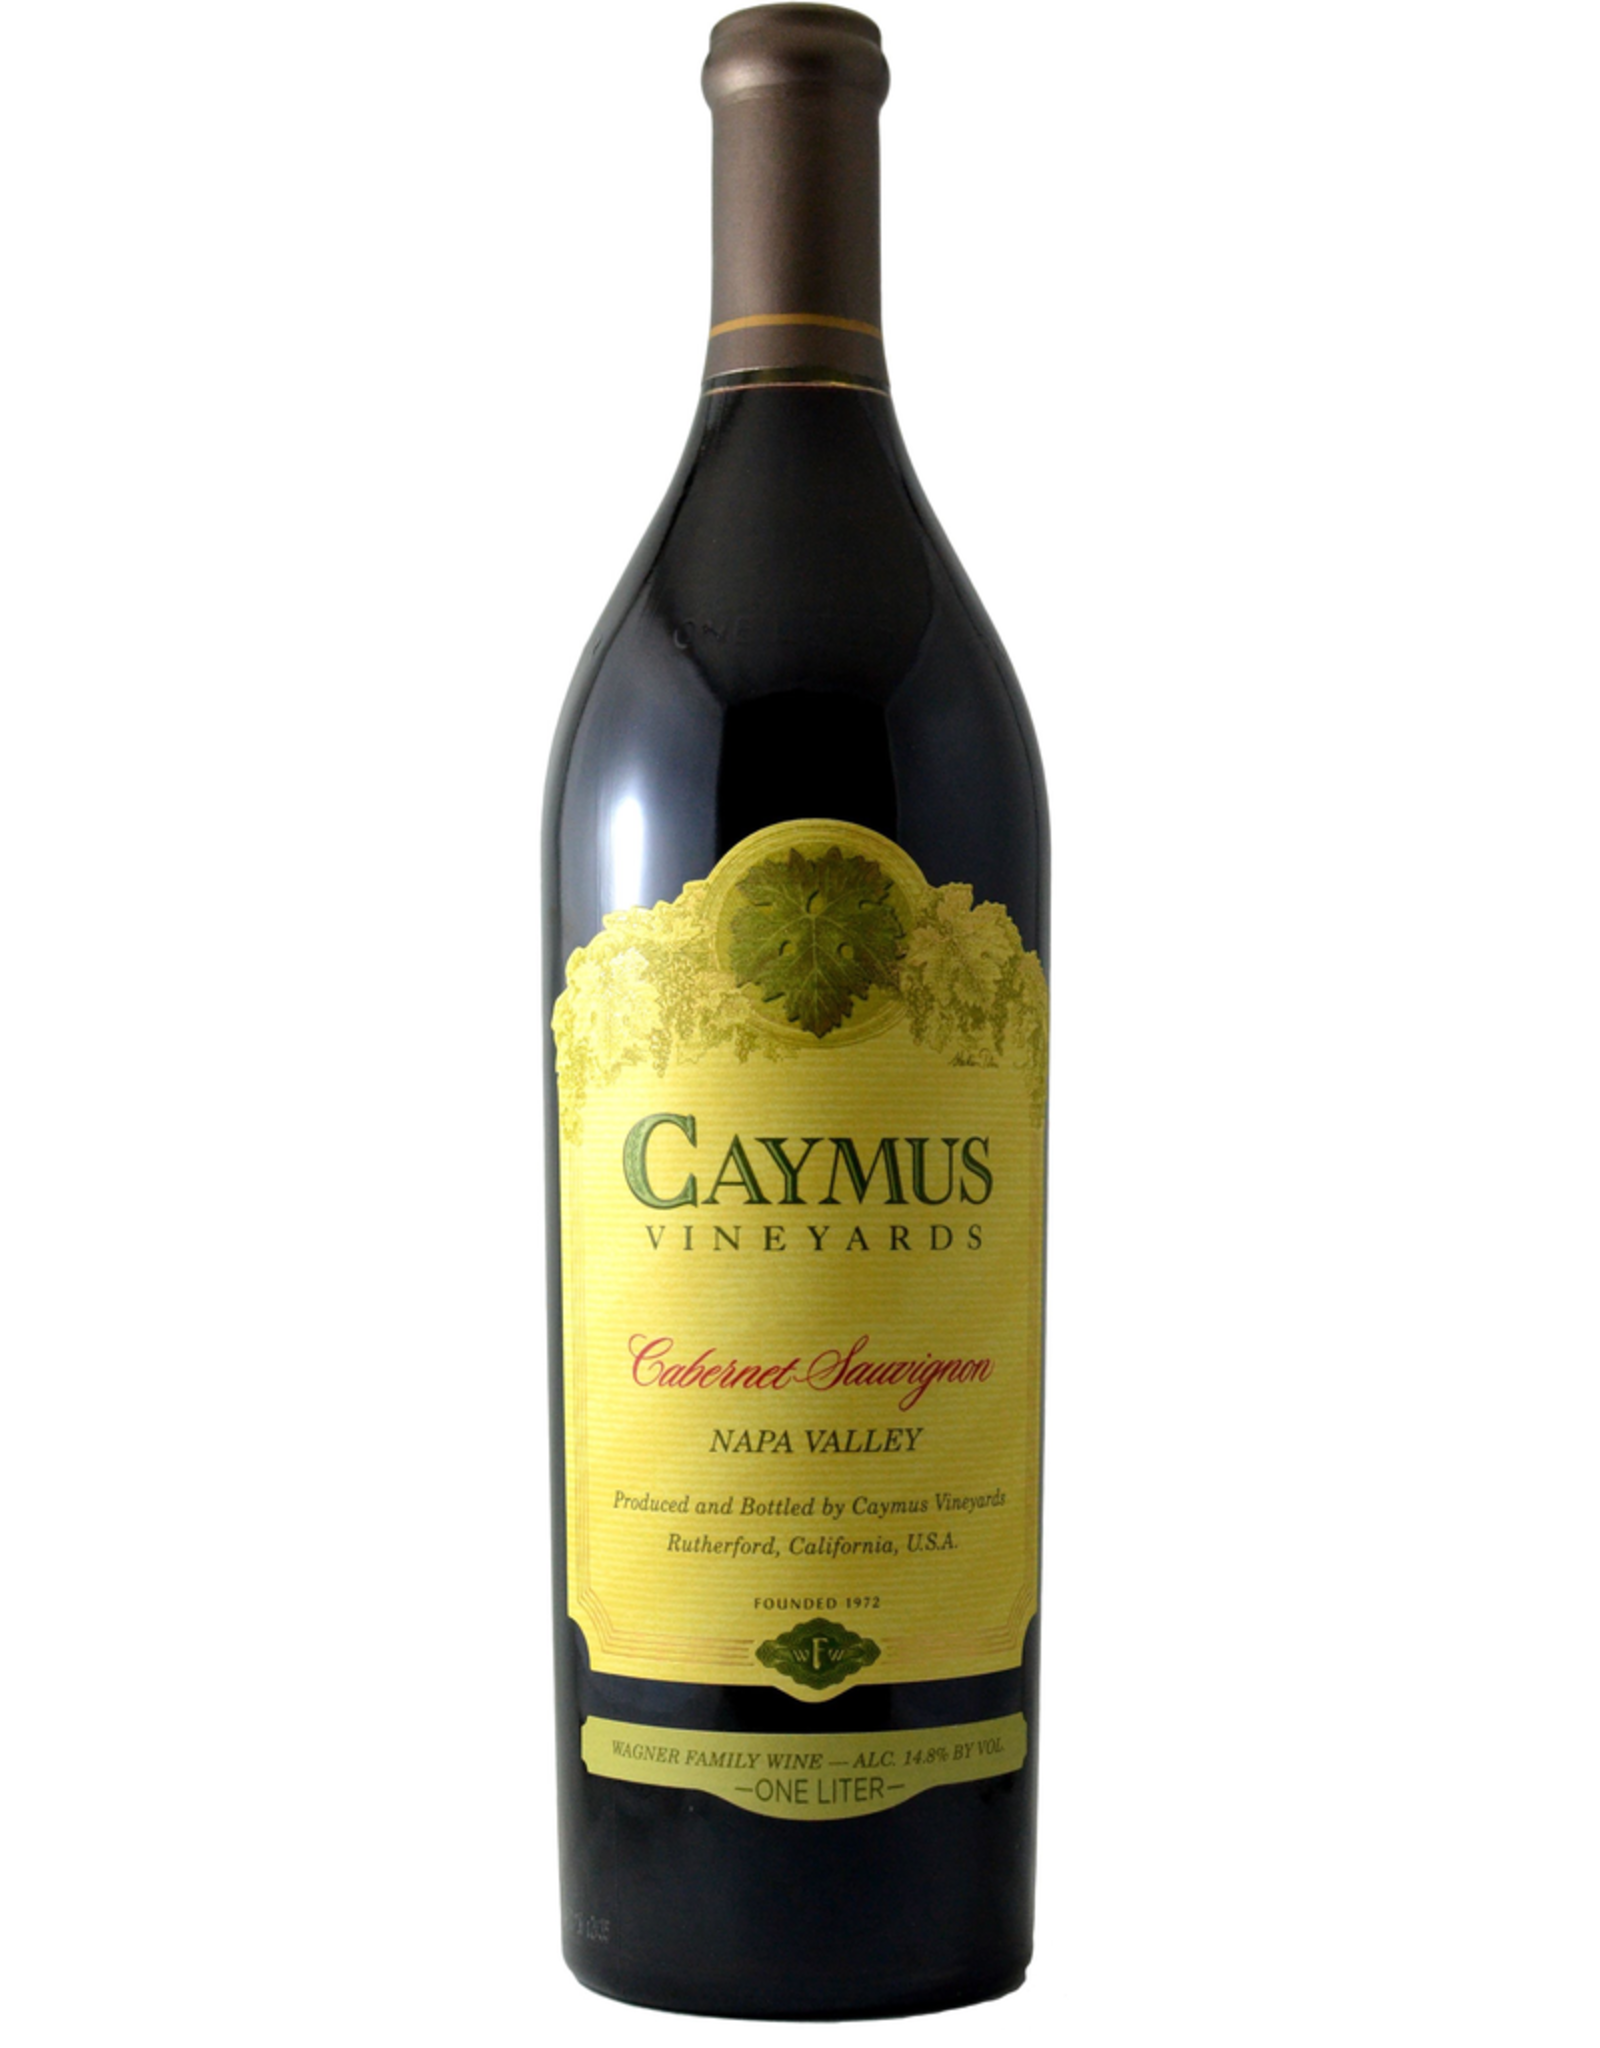 Red Wine 2018, Caymus Vineyards 1 Liter, Cabernet Sauvignon, Napa, Napa Valley, California, 14.6% Alc, CT